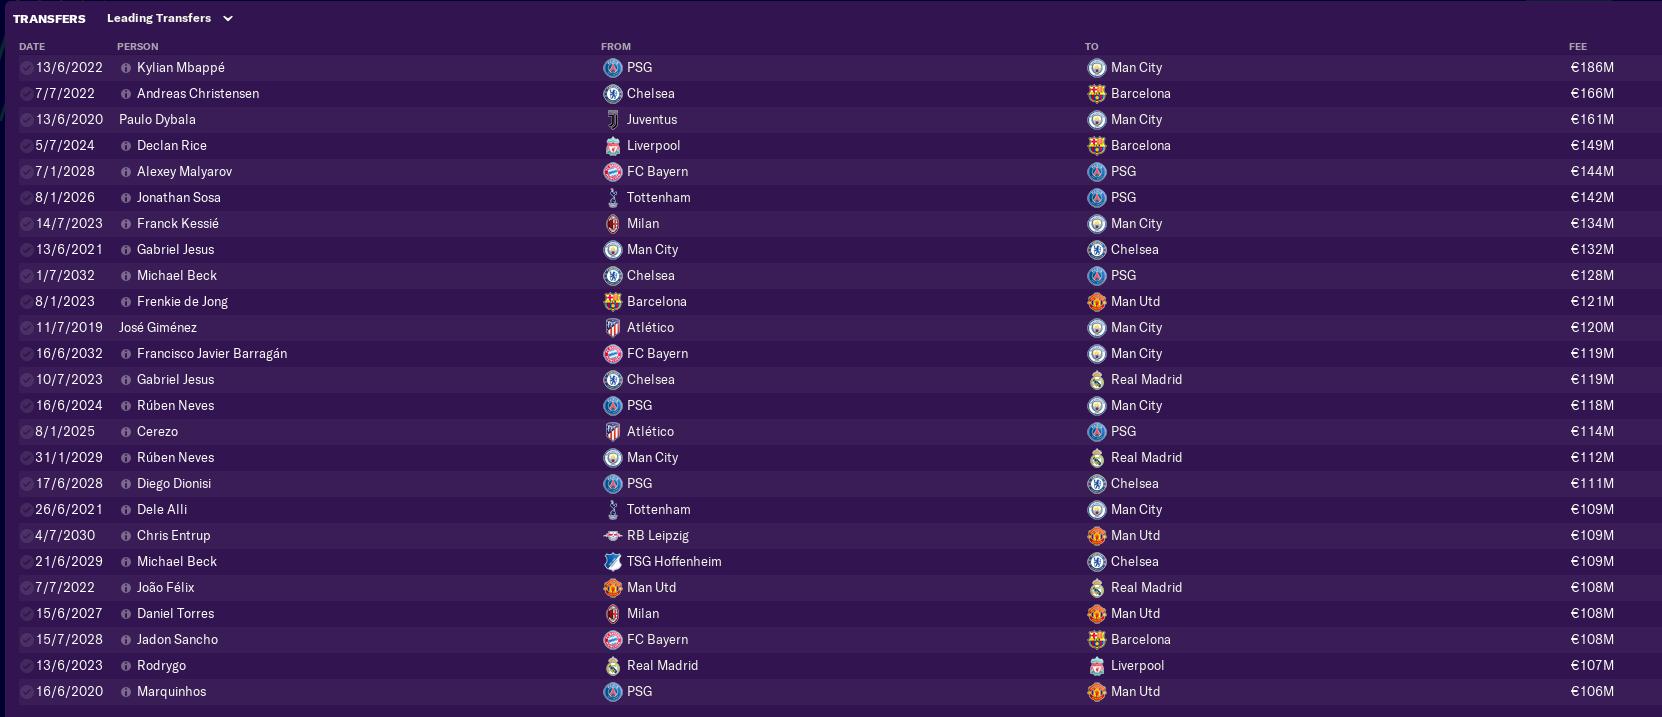 history-leading-transfers